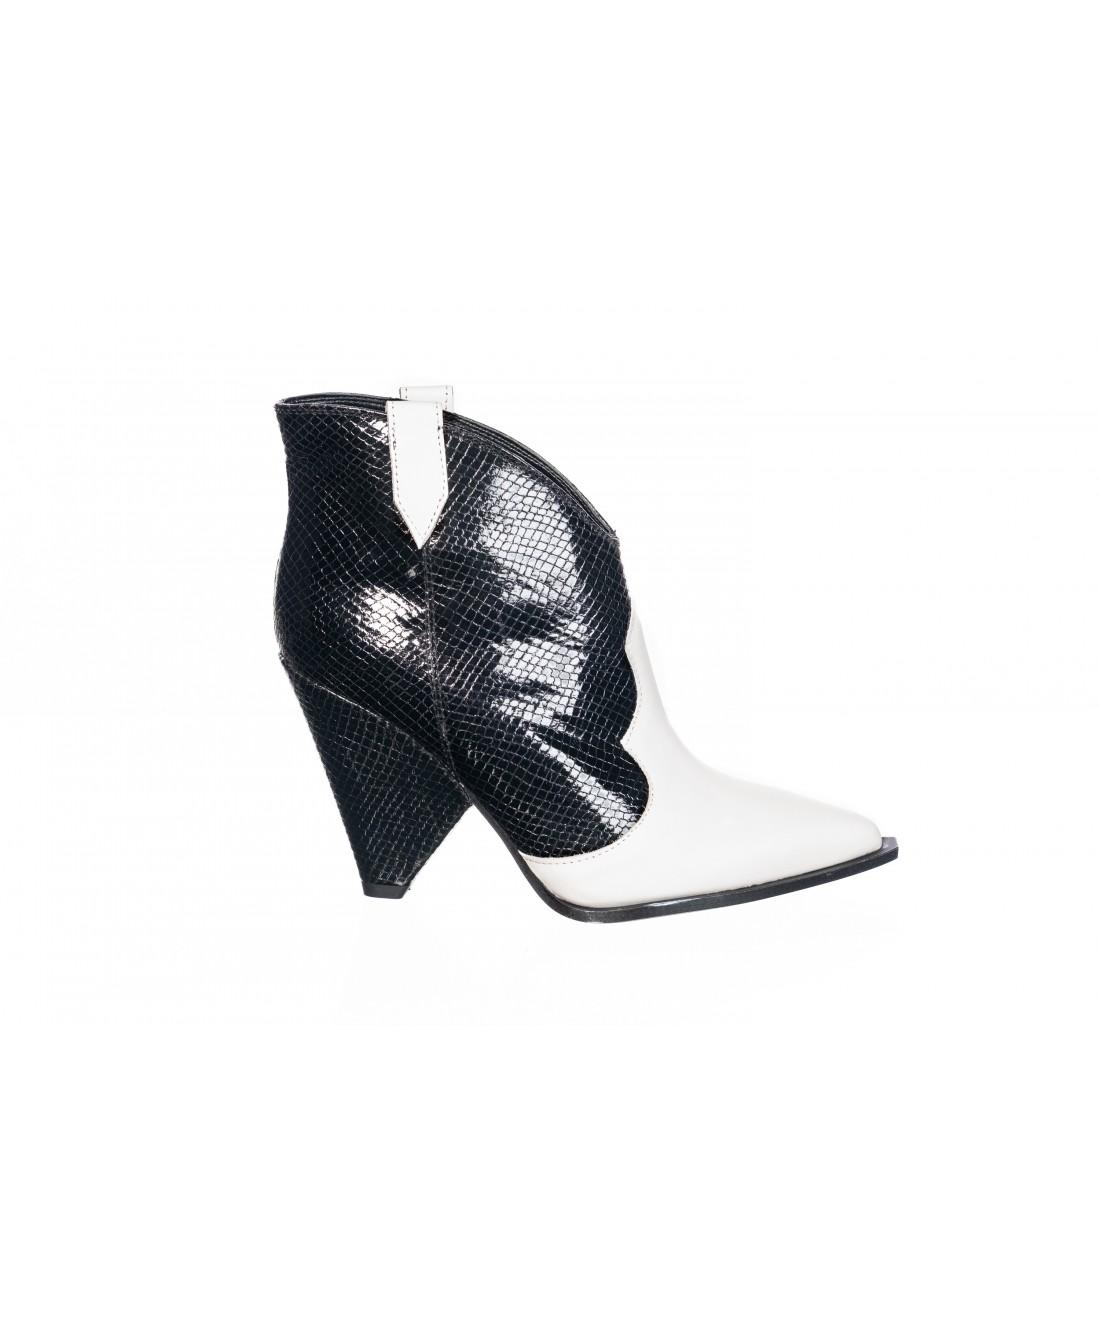 chi boots santiags blackwhite en signée La touche western n0NwXZO8Pk